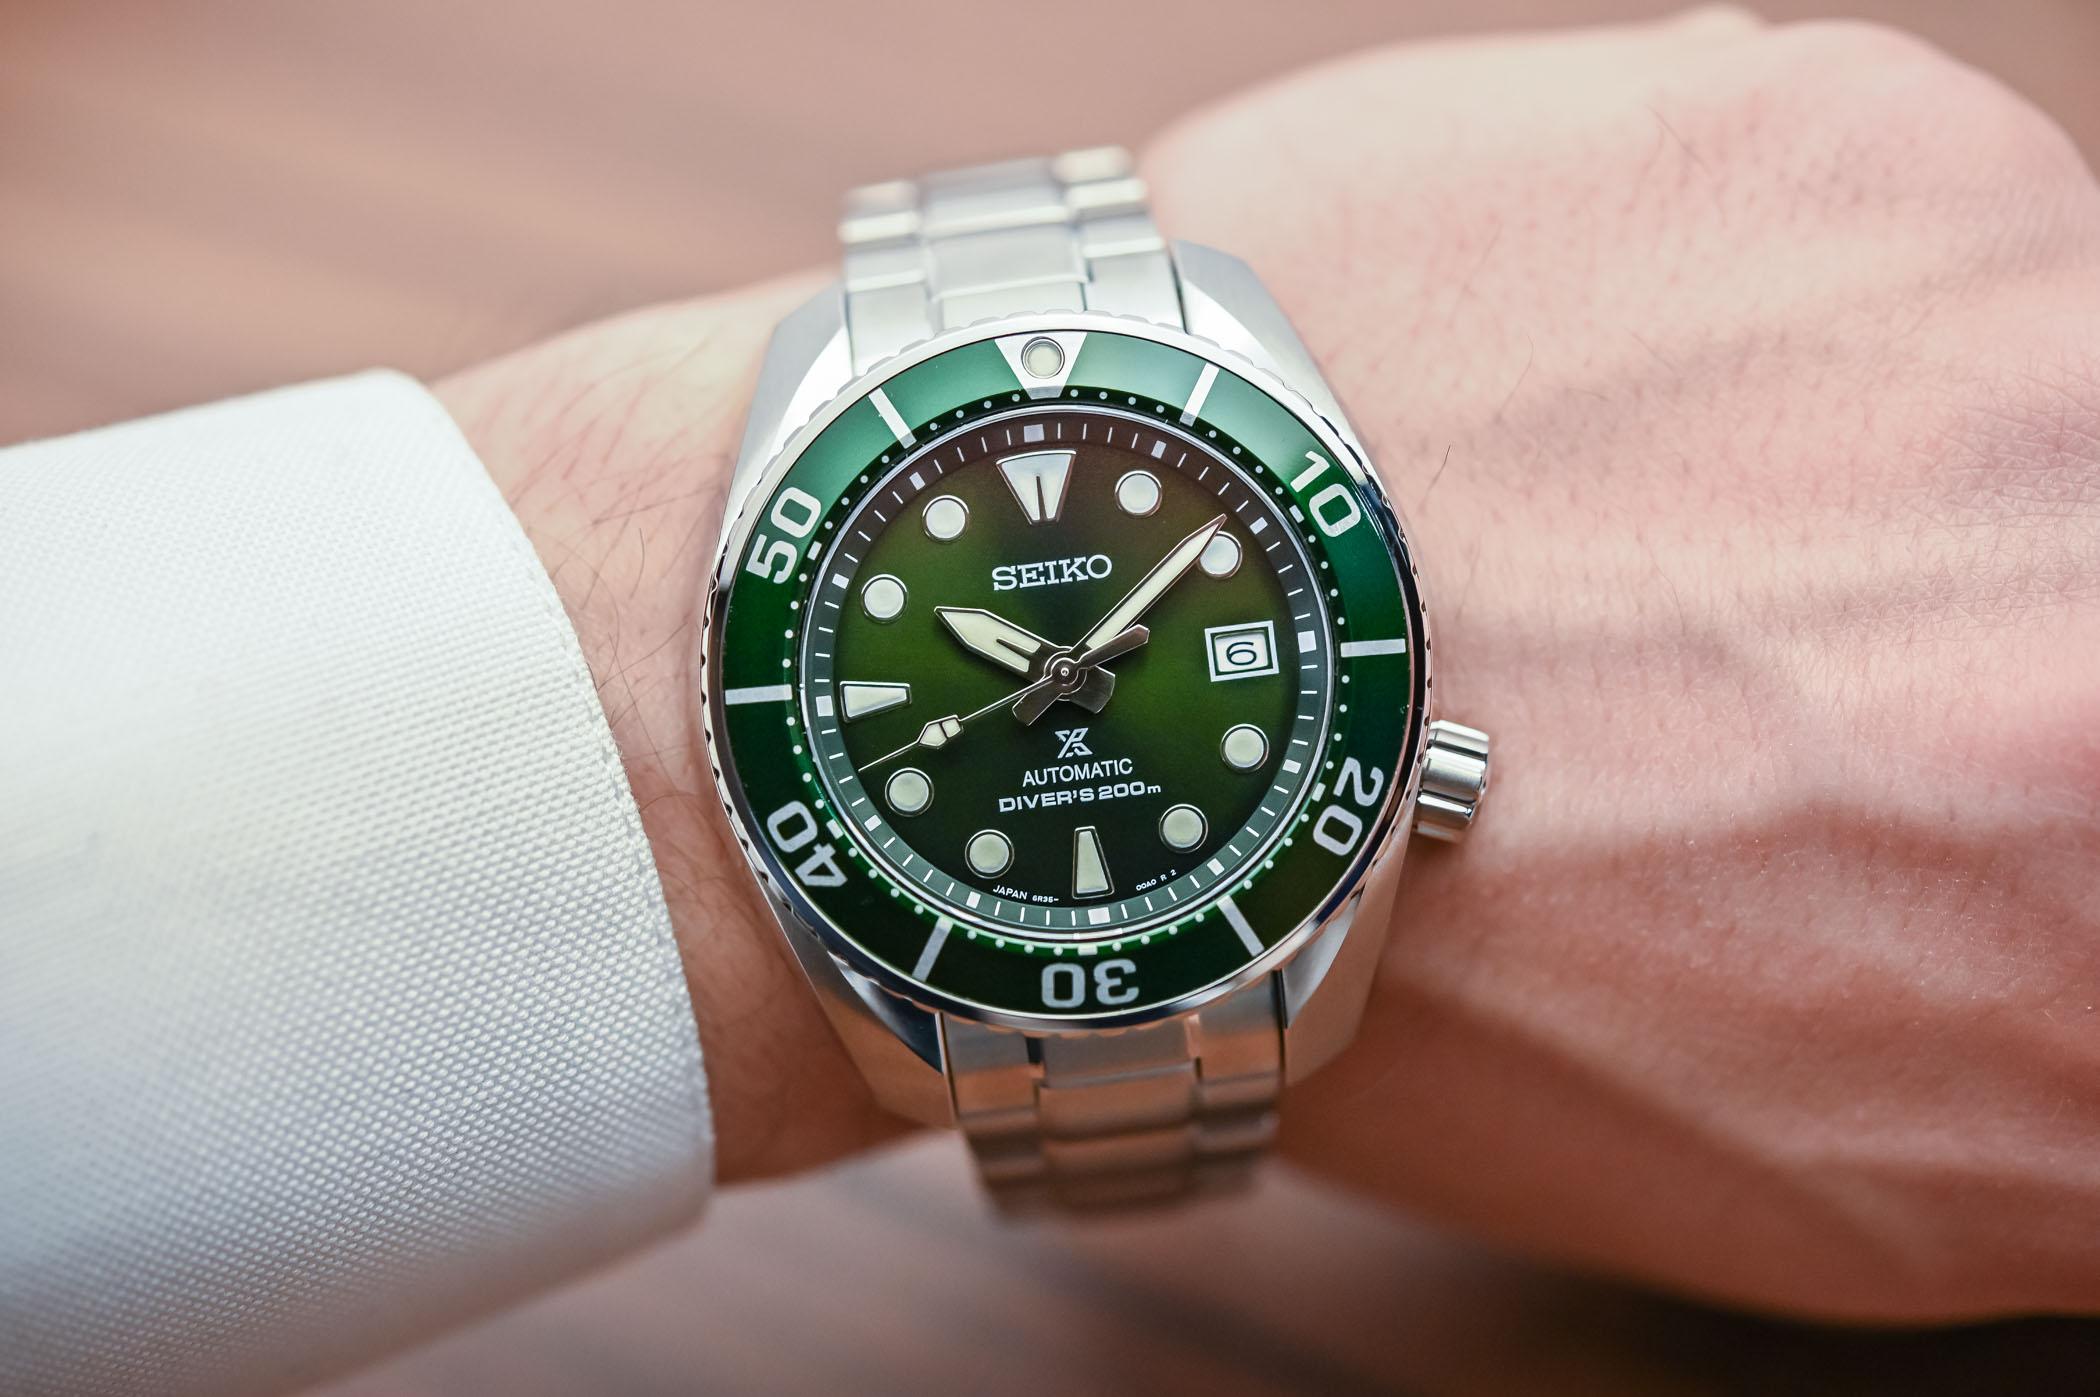 Seiko-Sumo-Prospex-Diver-200m-SPB103J1-2-1